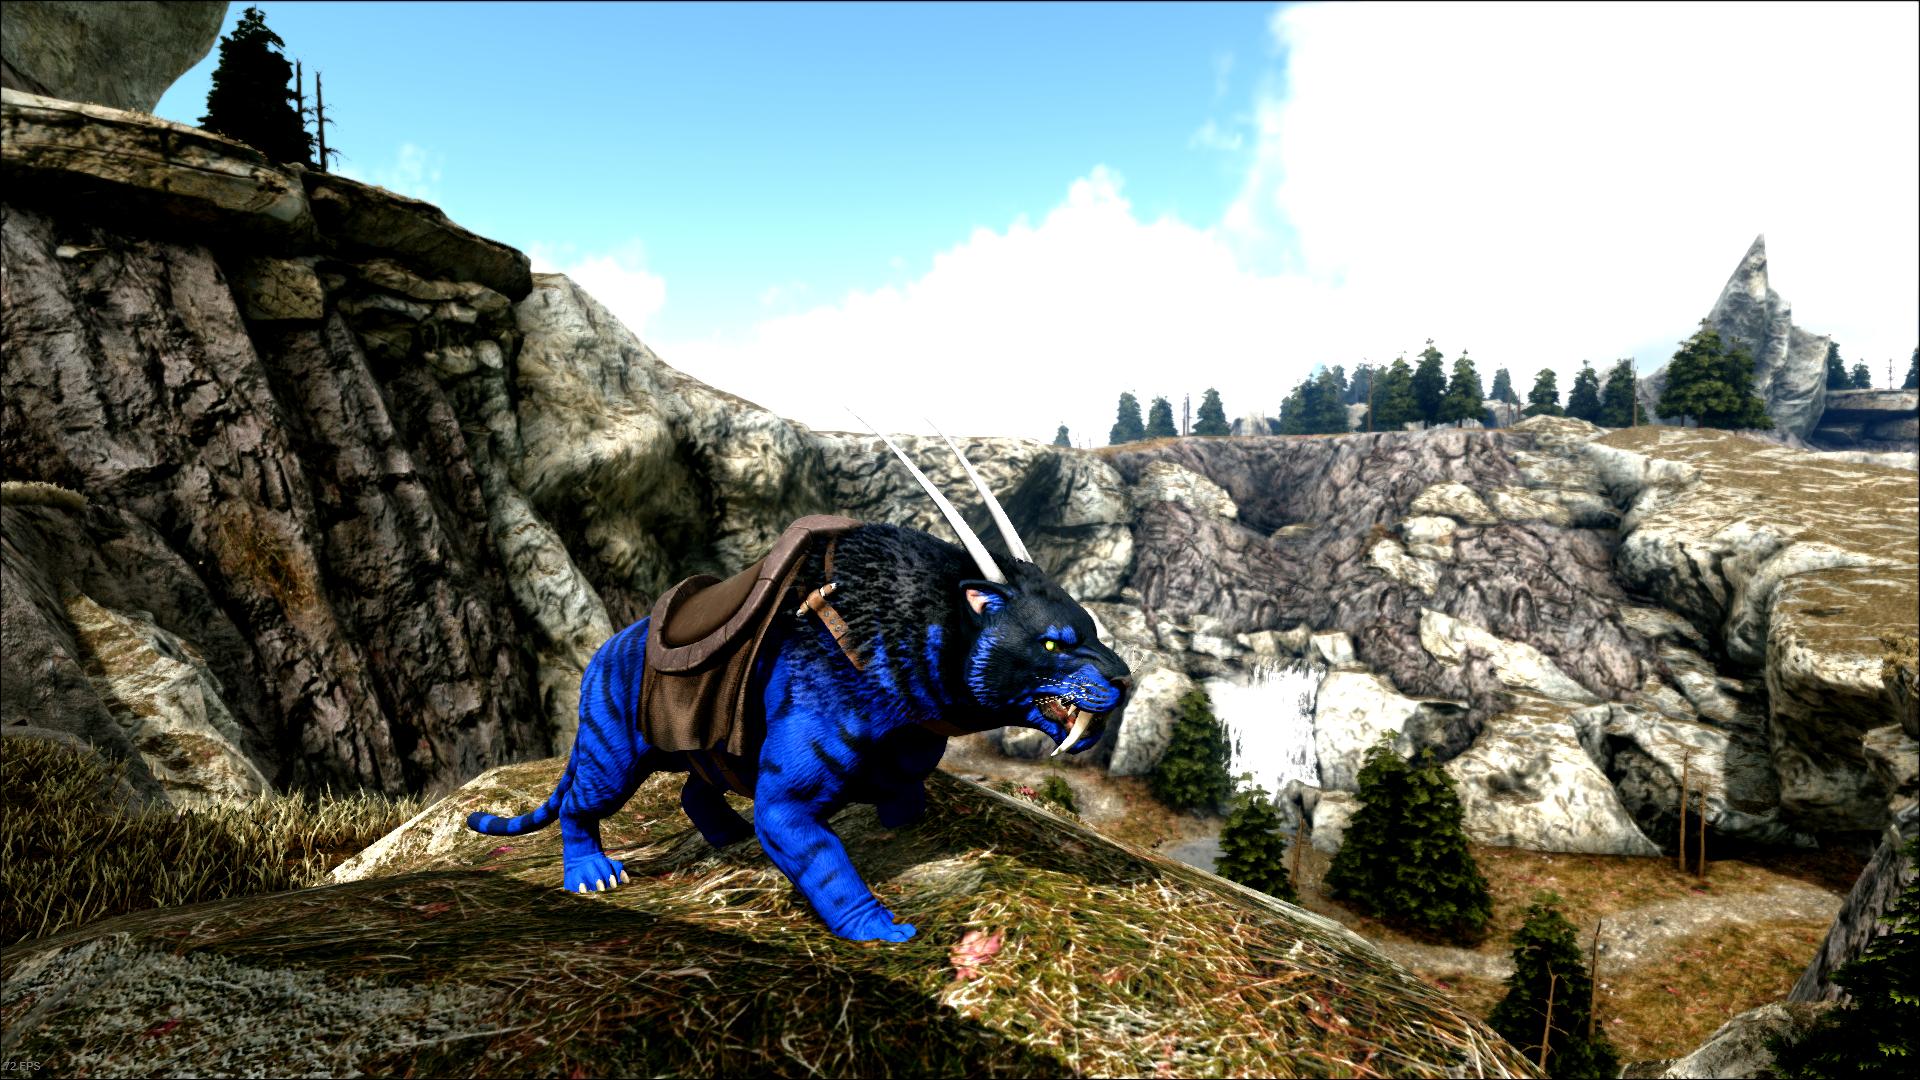 ARK  Survival Evolved Screenshot 2020.06.03 - 15.38.52.30 Thumbnail.png